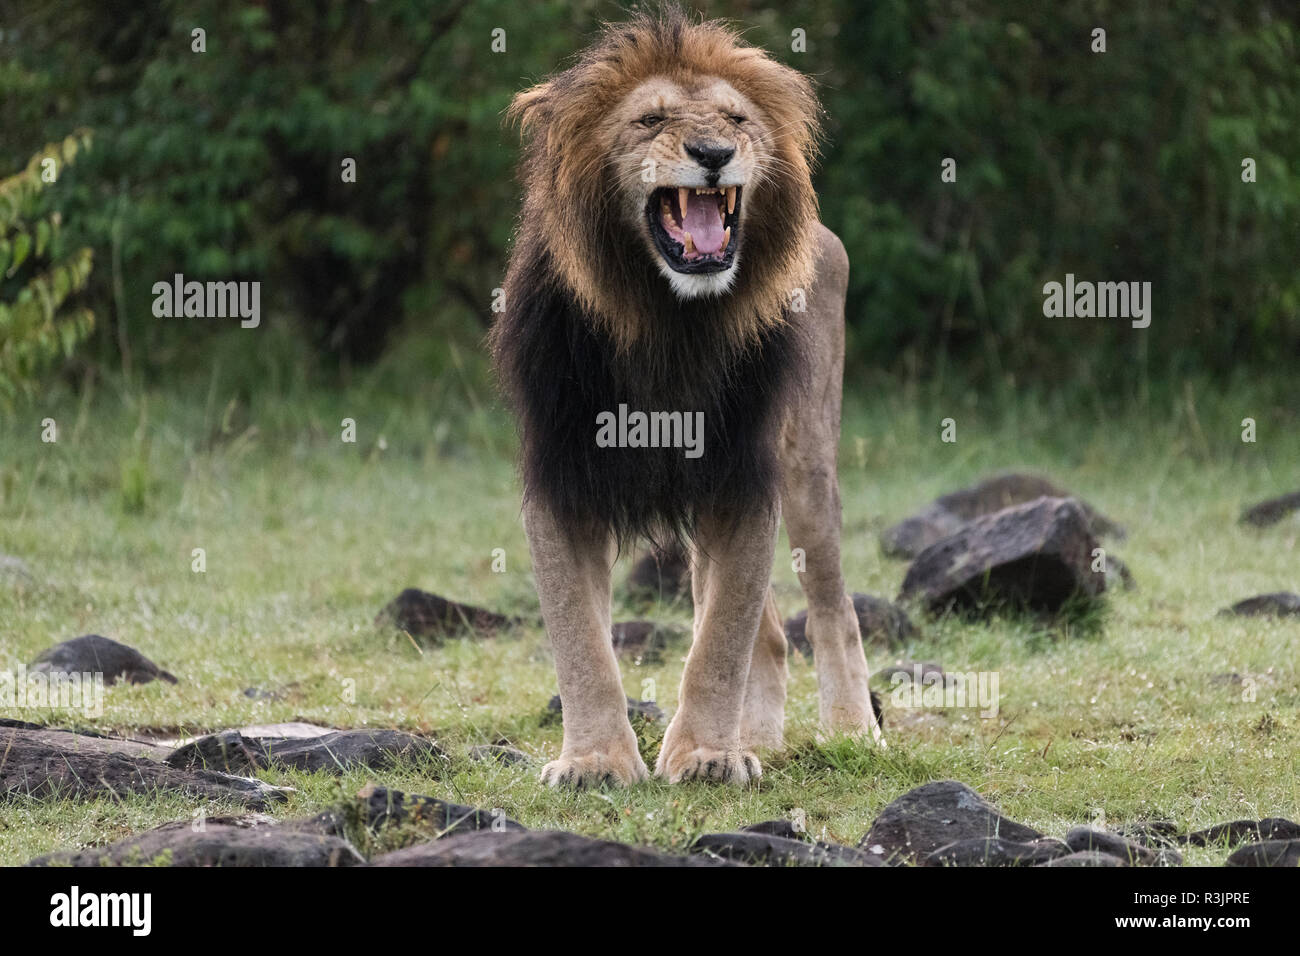 Africa, Kenya, Maasai Mara National Reserve. Snarling male lion. Credit as: Bill Young / Jaynes Gallery / DanitaDelimont.com - Stock Image